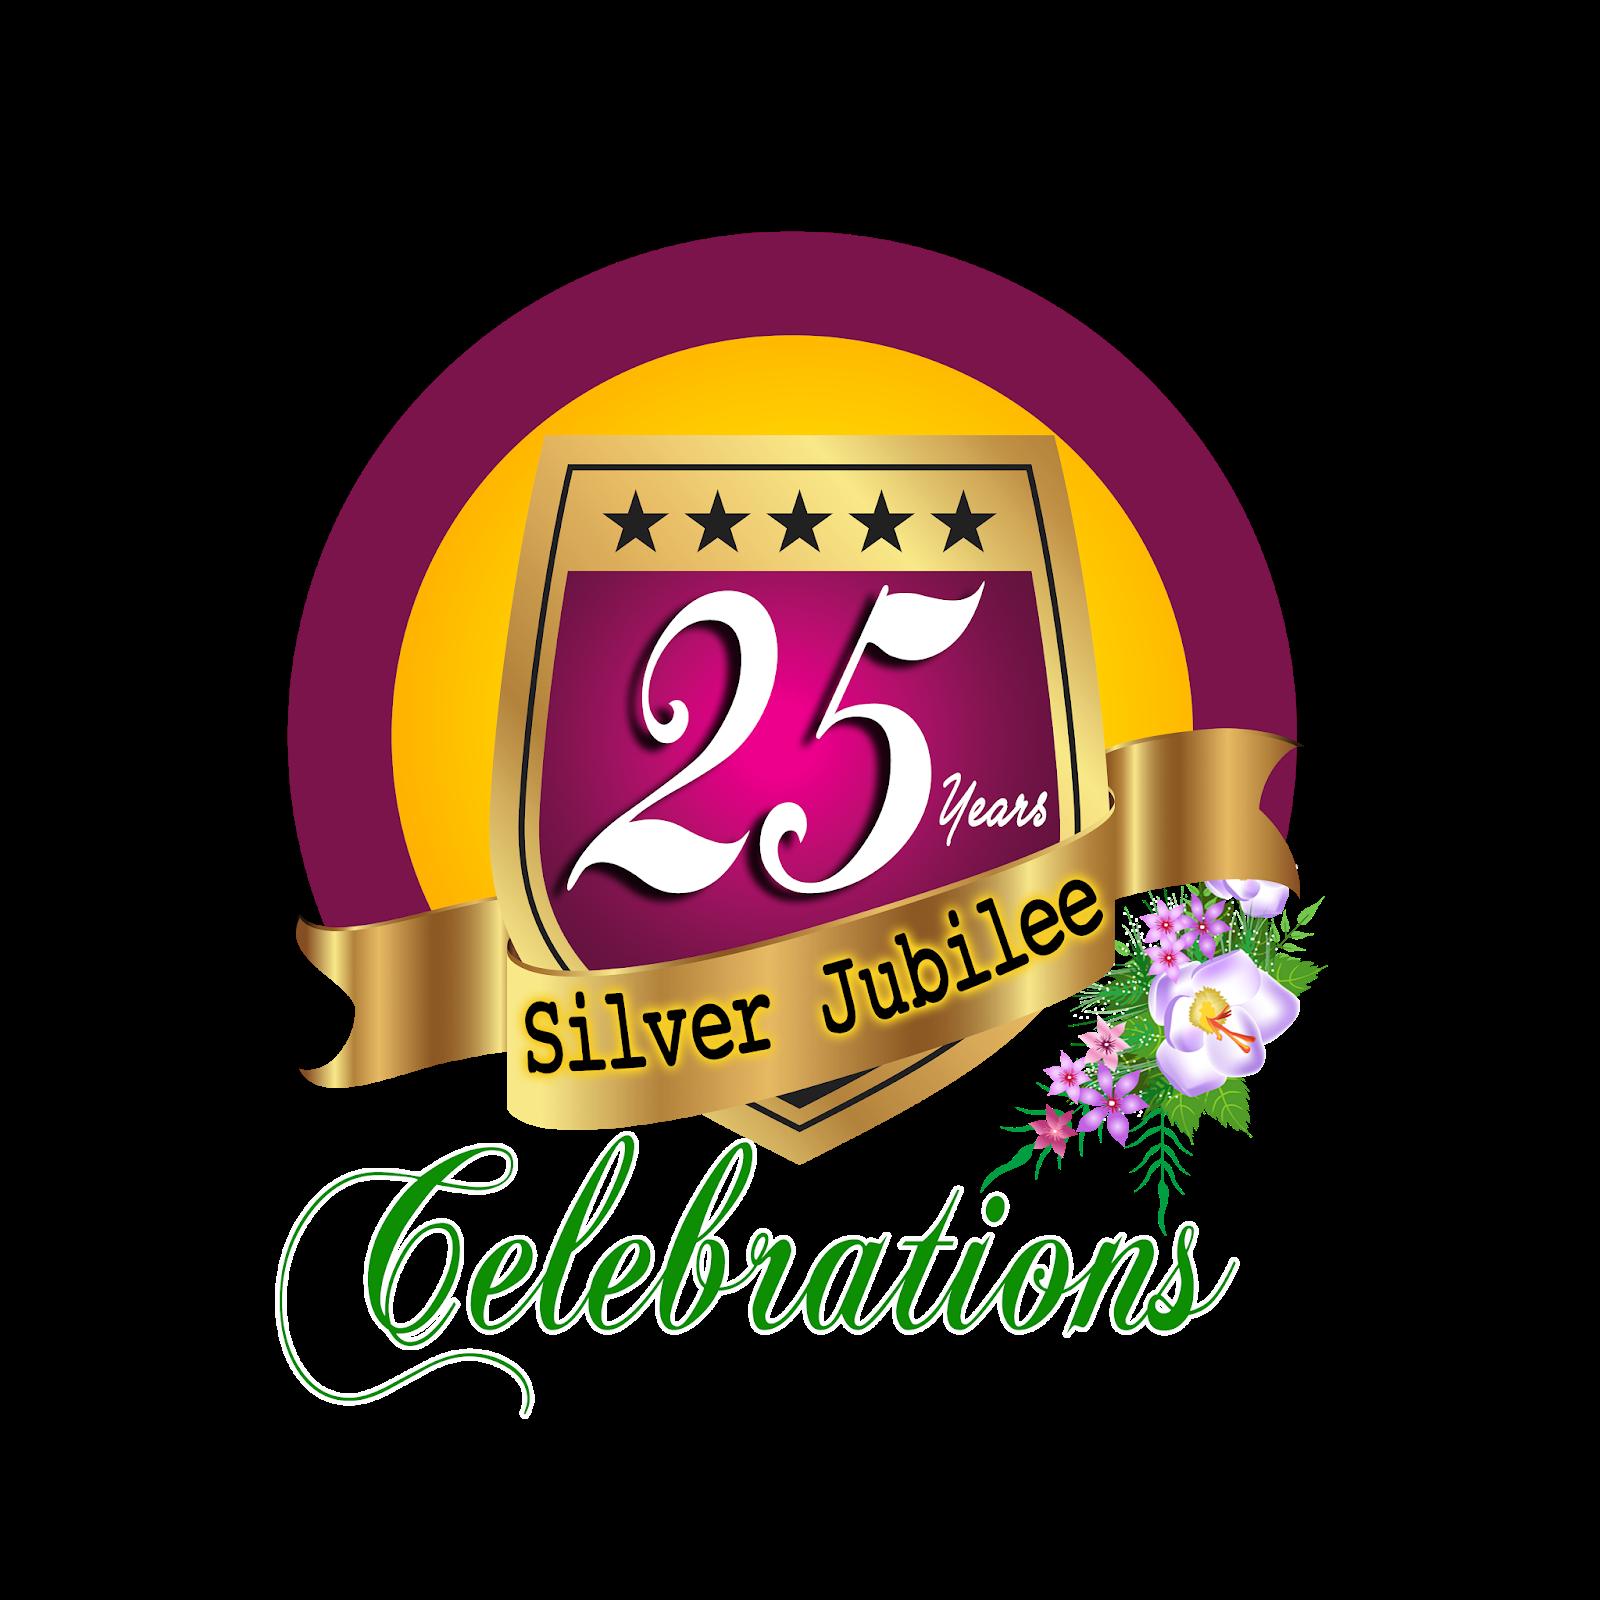 25 Years Silver Jubilee Celebrations Hd Png Logo Free Downloads